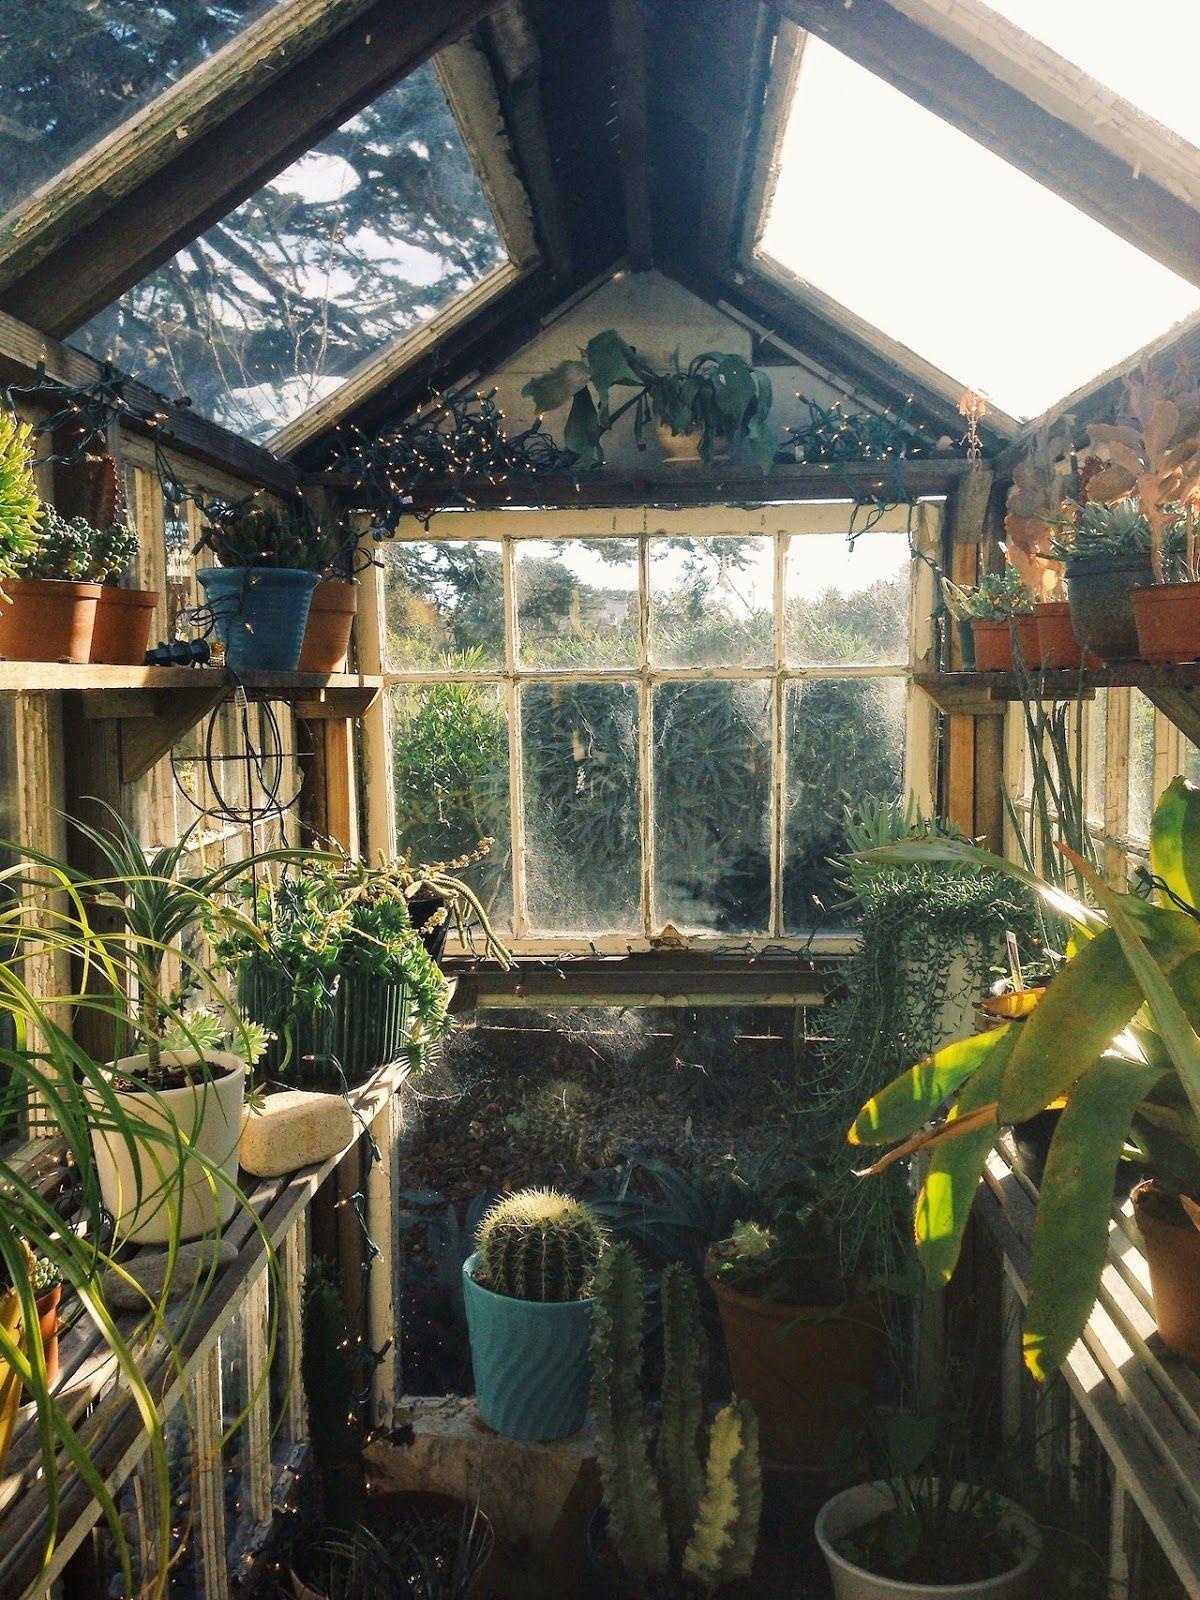 Mes Coups De Coeur Tumblr #2 | Jardin D'hiver, Jardin ... destiné Abri De Jardin Super U